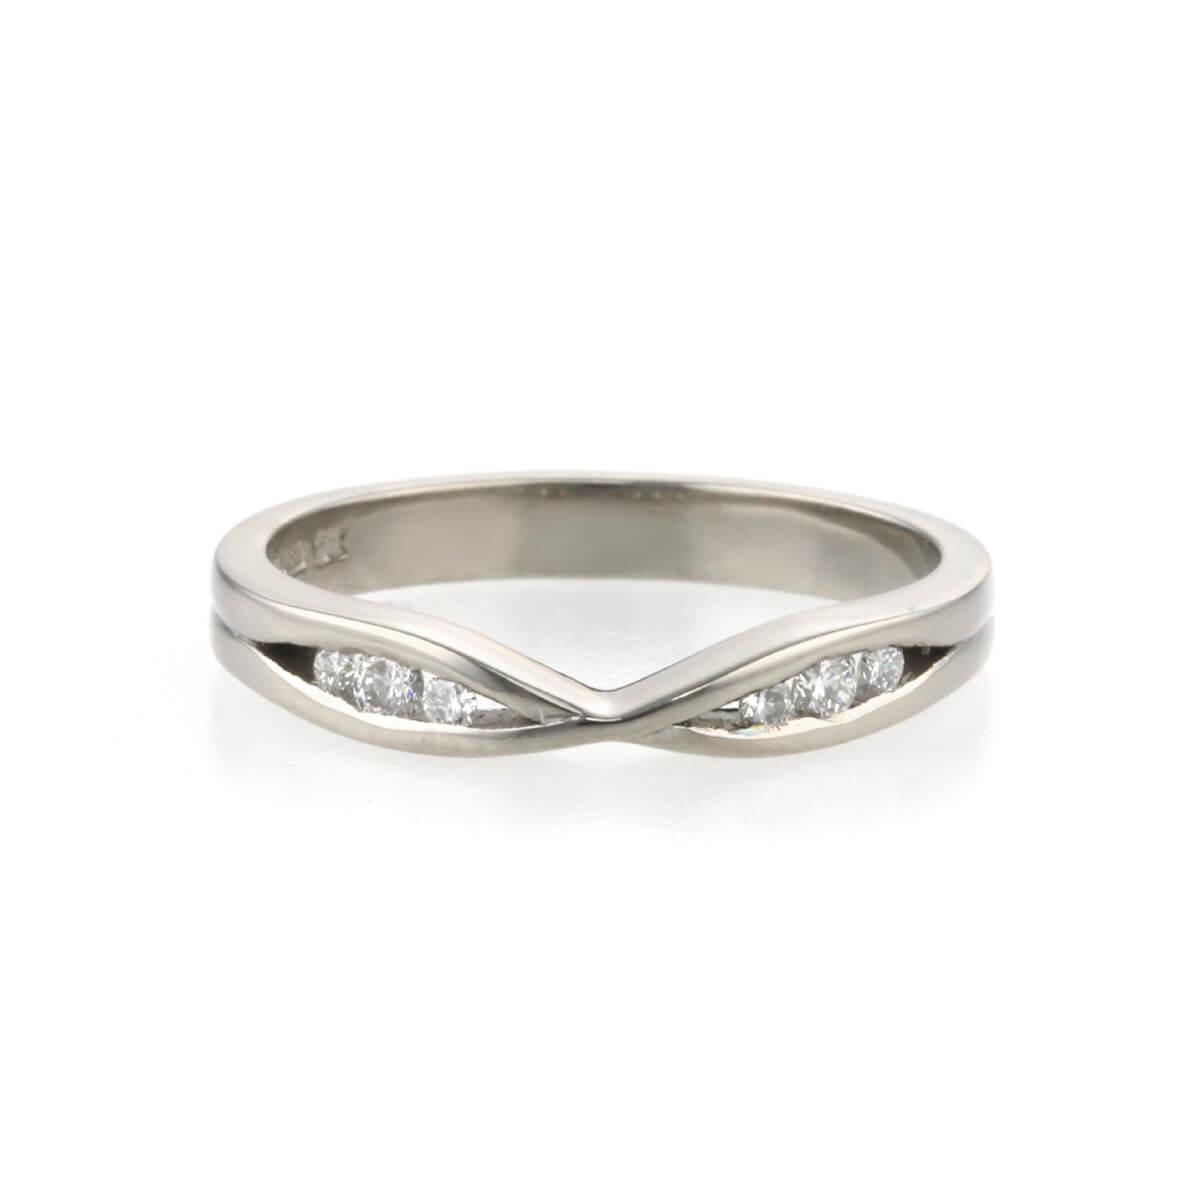 18ct-ladies-w-diamond-infinity-inspired-wedding-ring